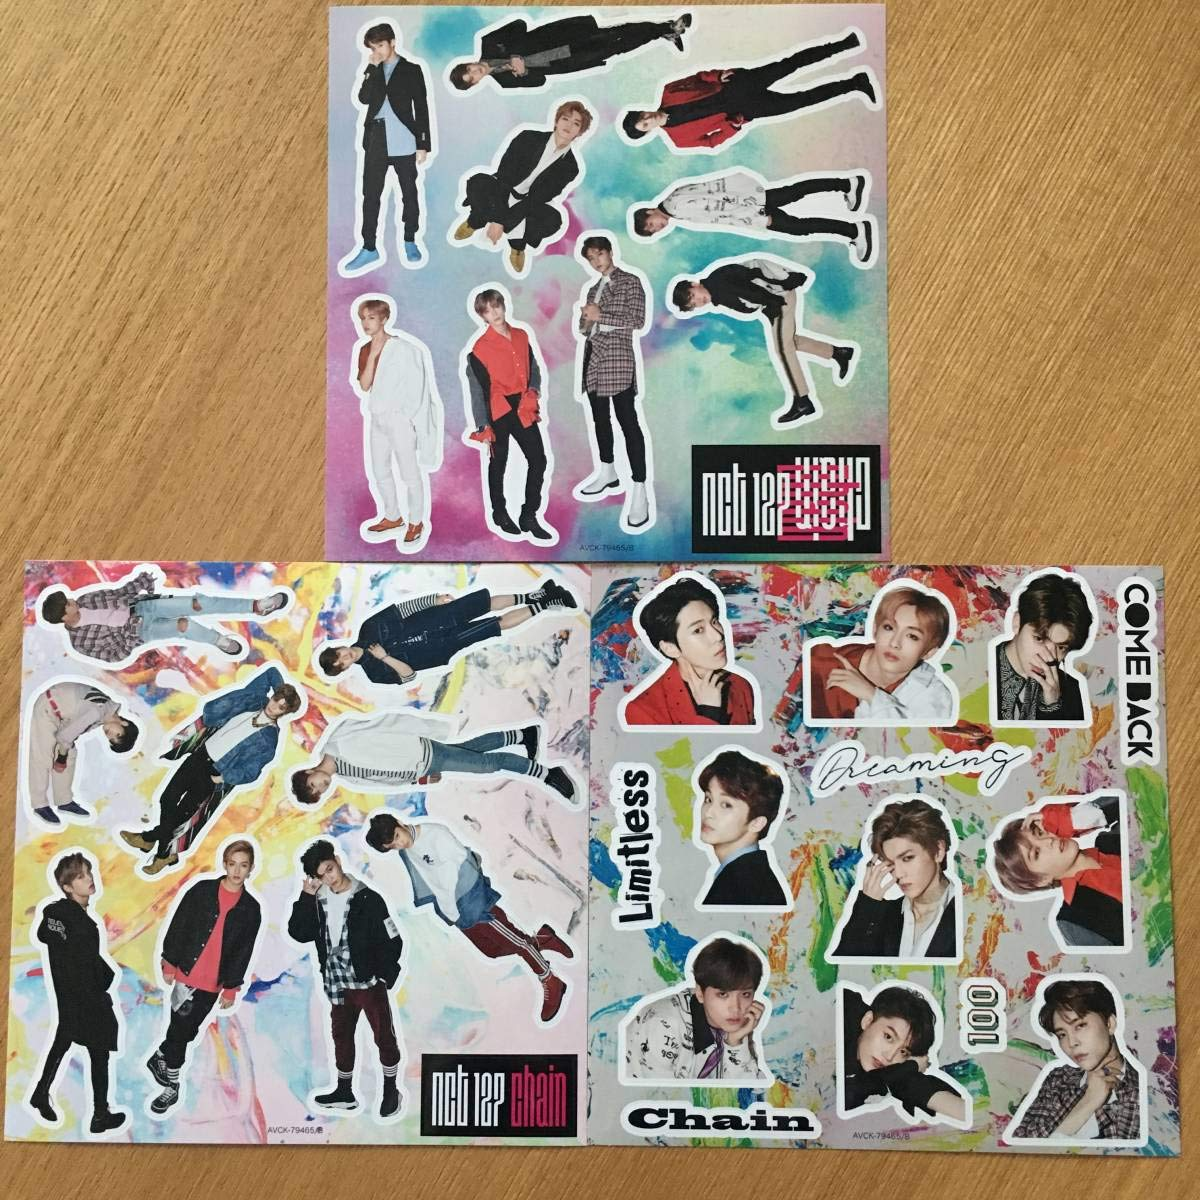 NCT 127 日本デビューアルバム Chain 初回限定特典 ステッカー3枚セット   B07QBBPLSC